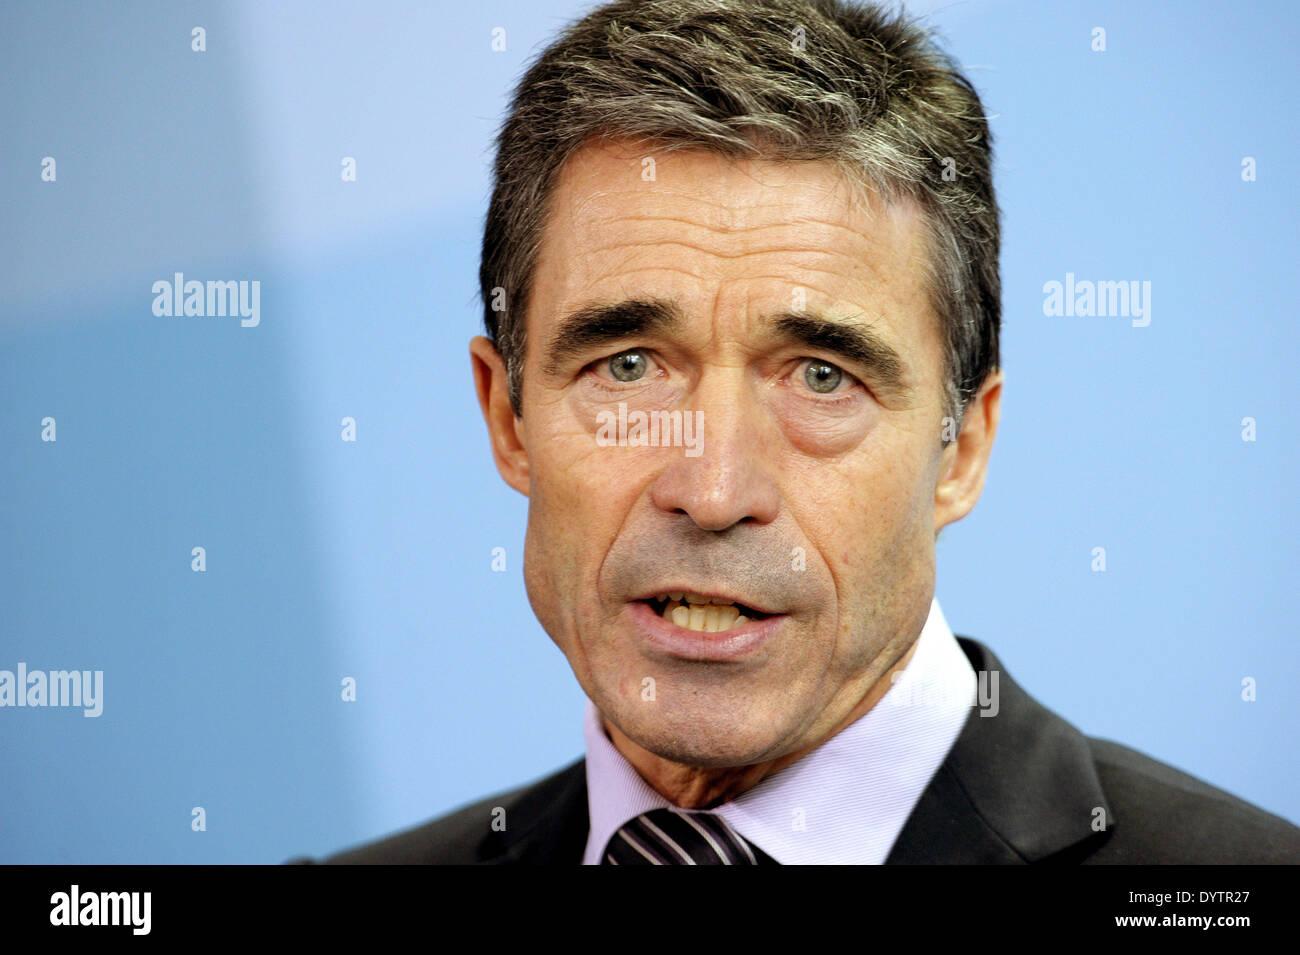 Anders Fogh Rasmussen Stock Photo